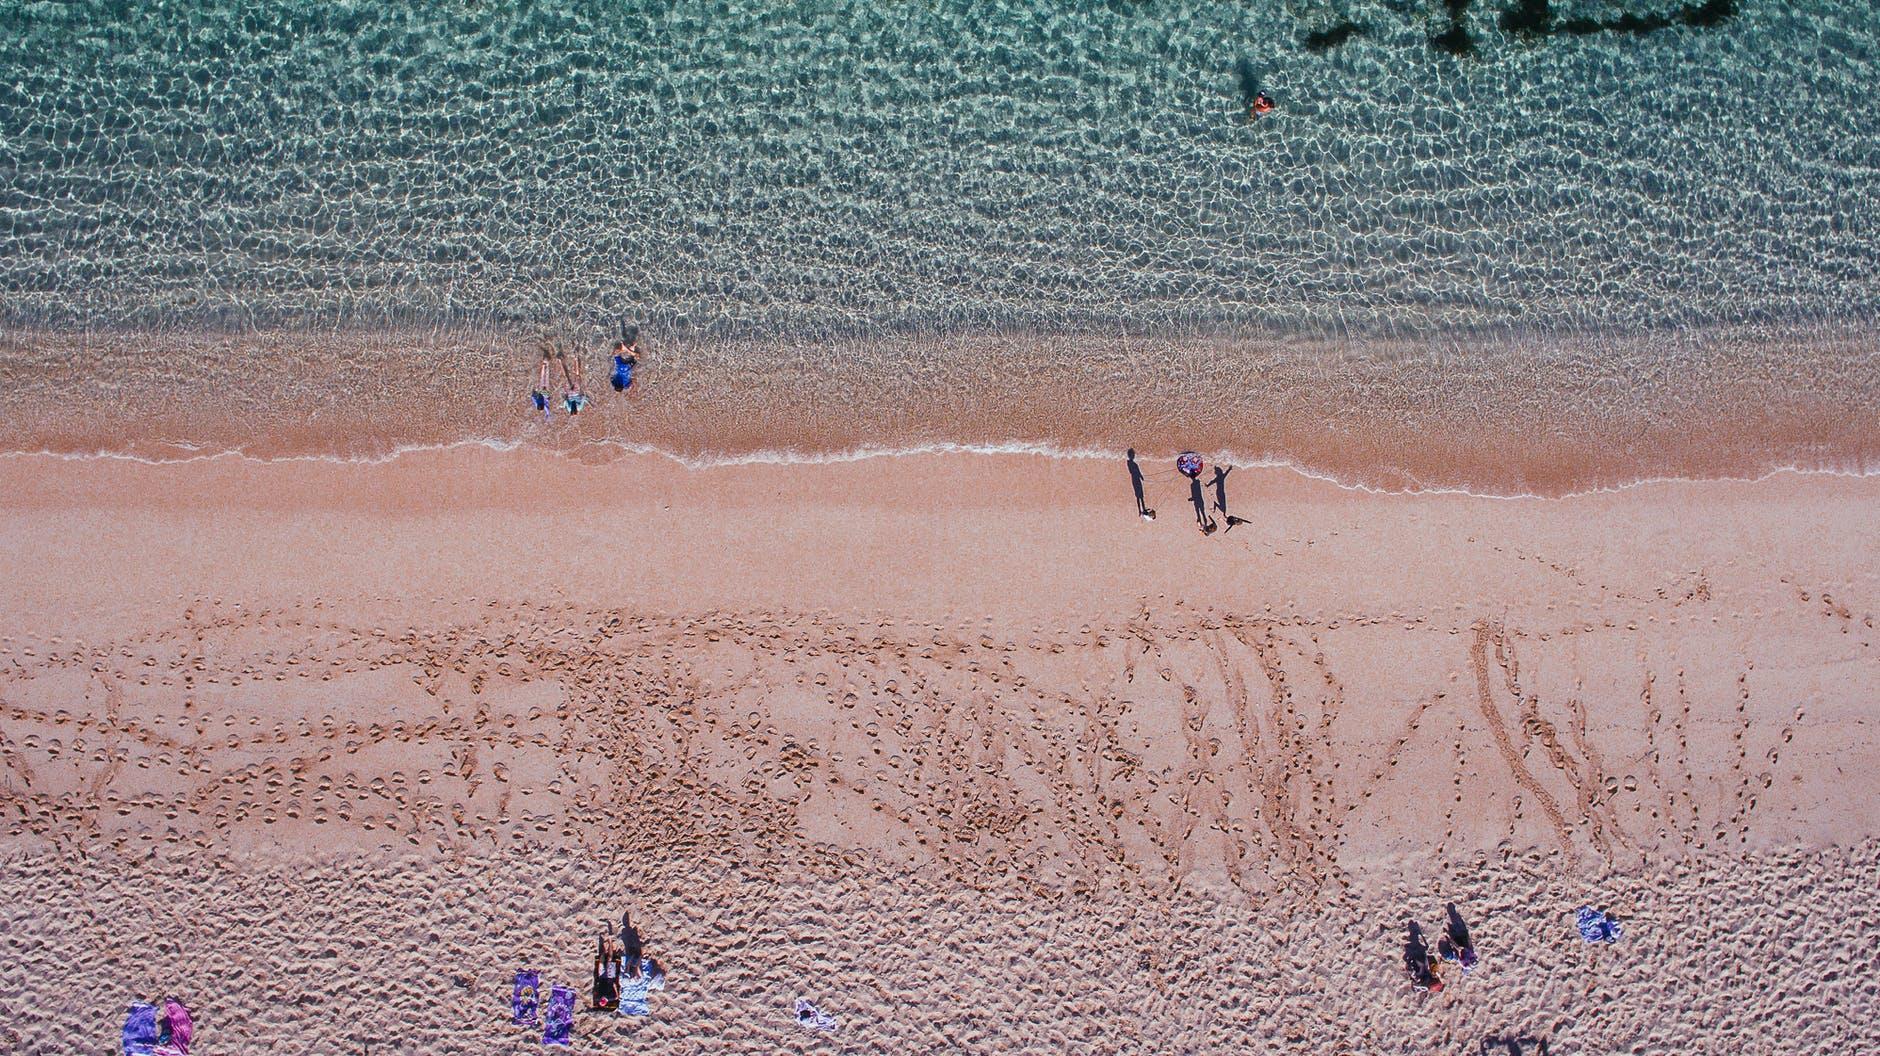 Students strolling on sandy beach near coastal universities | UniHomes | PBSA News